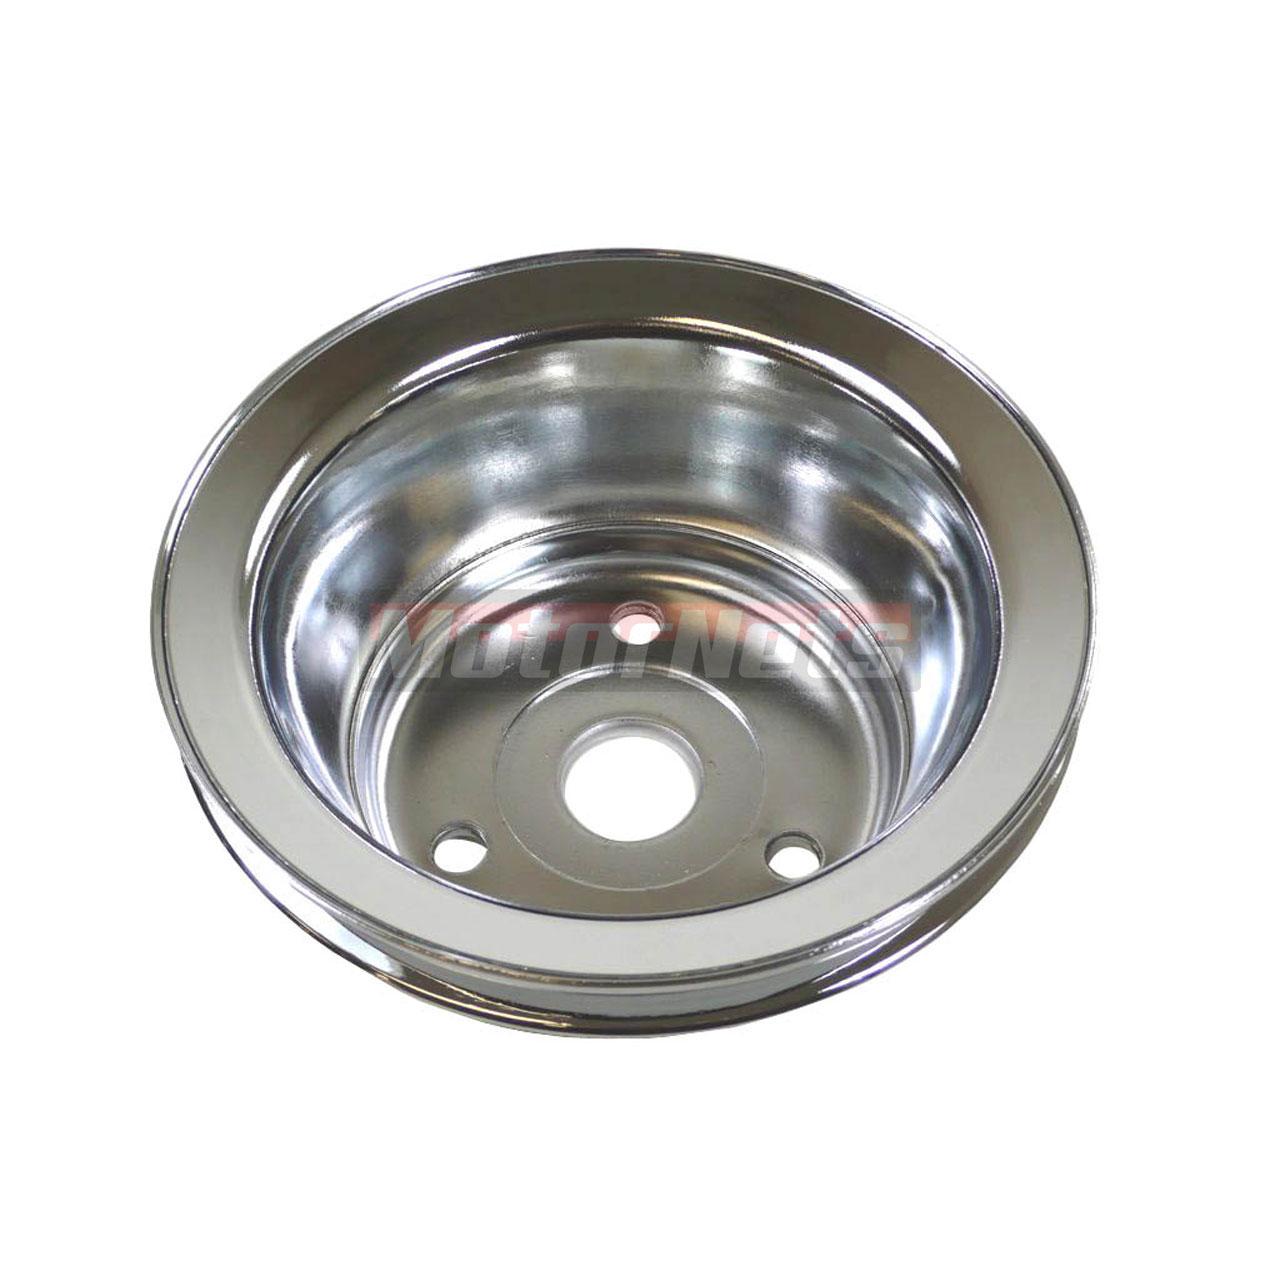 Chrome Steel Small Block Chevy 283 350 LWP Crankshaft